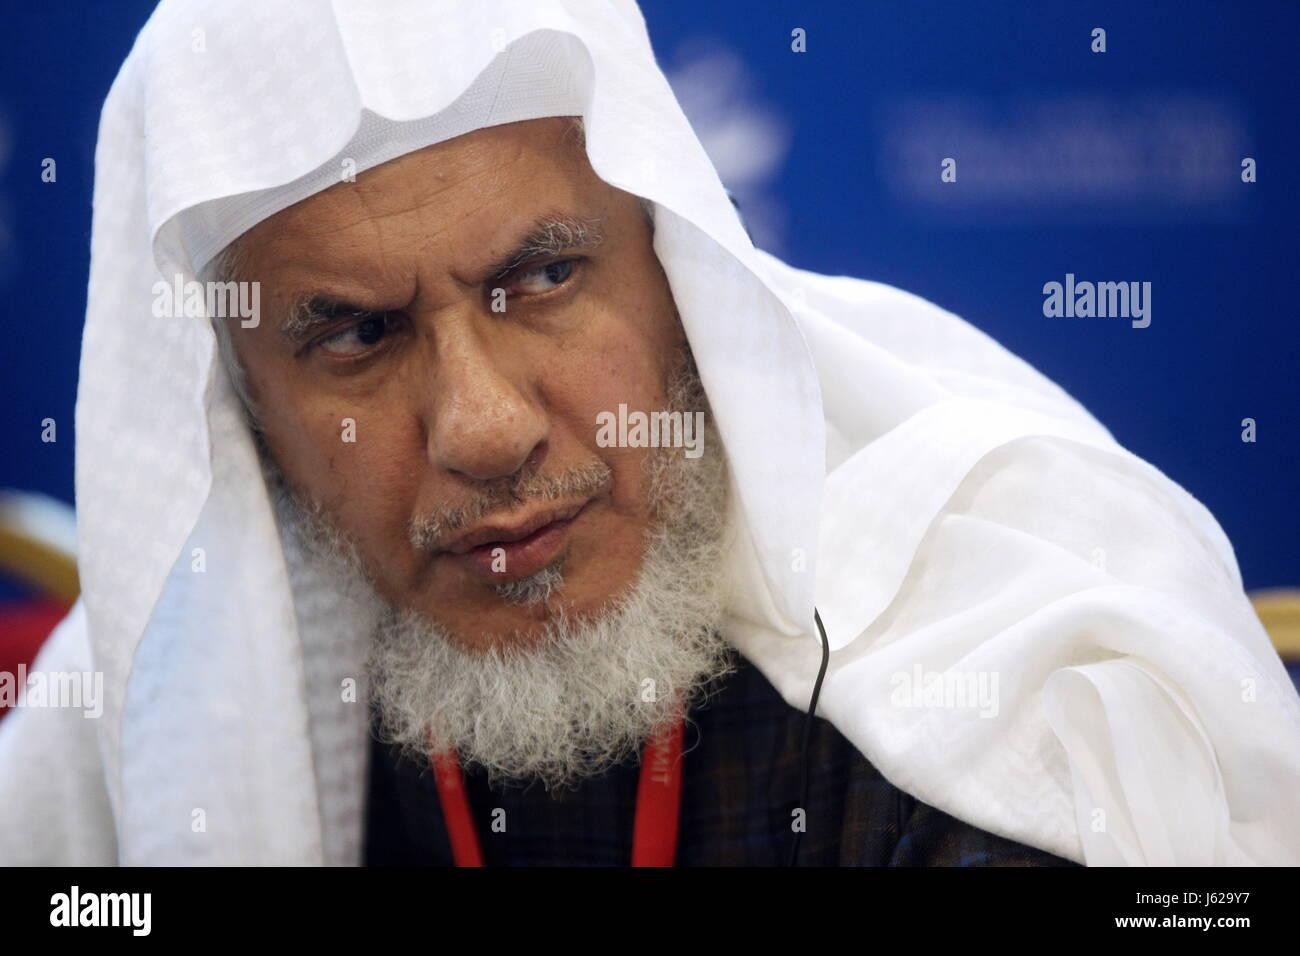 Kazan, Russia. 18th May, 2017. Abdurrahman bin Salih Al-Atram, Secretary General of the World Islamic Foundation Stock Photo